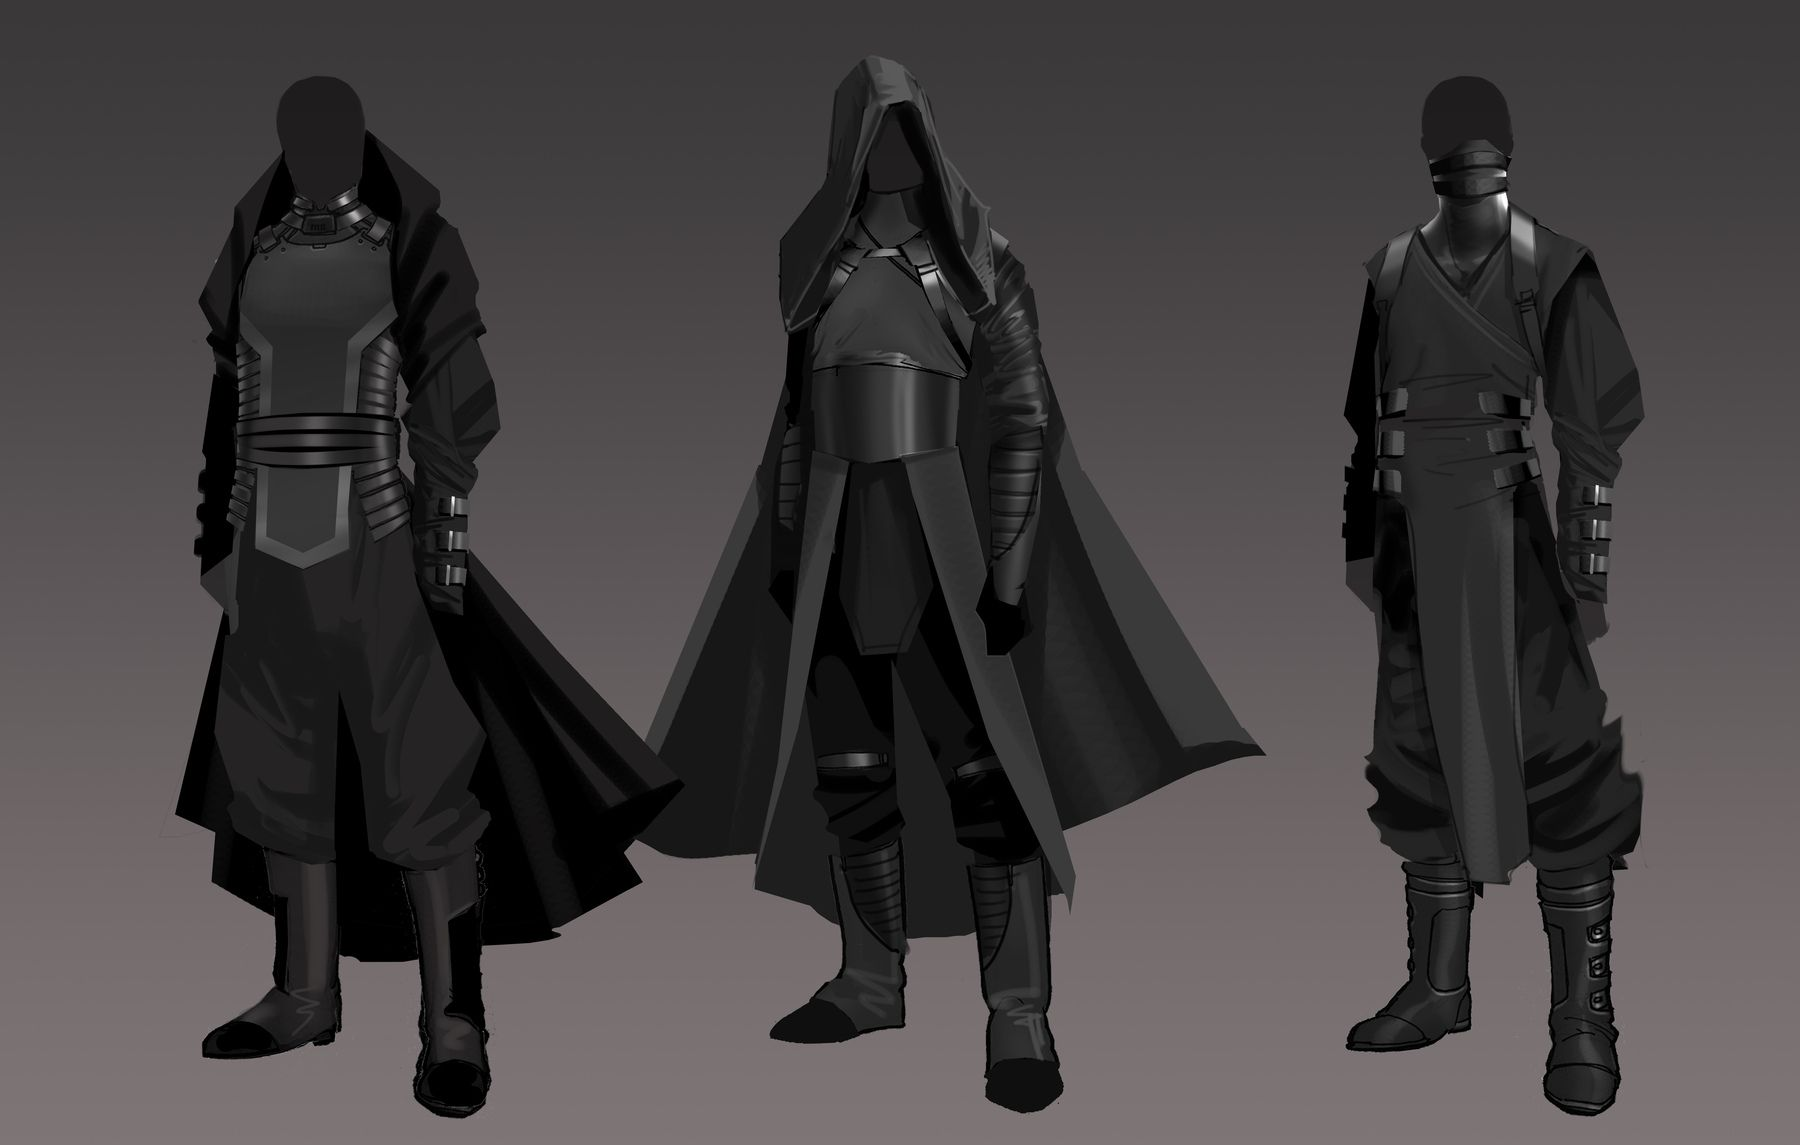 Grey Jedi Robes Concept Art